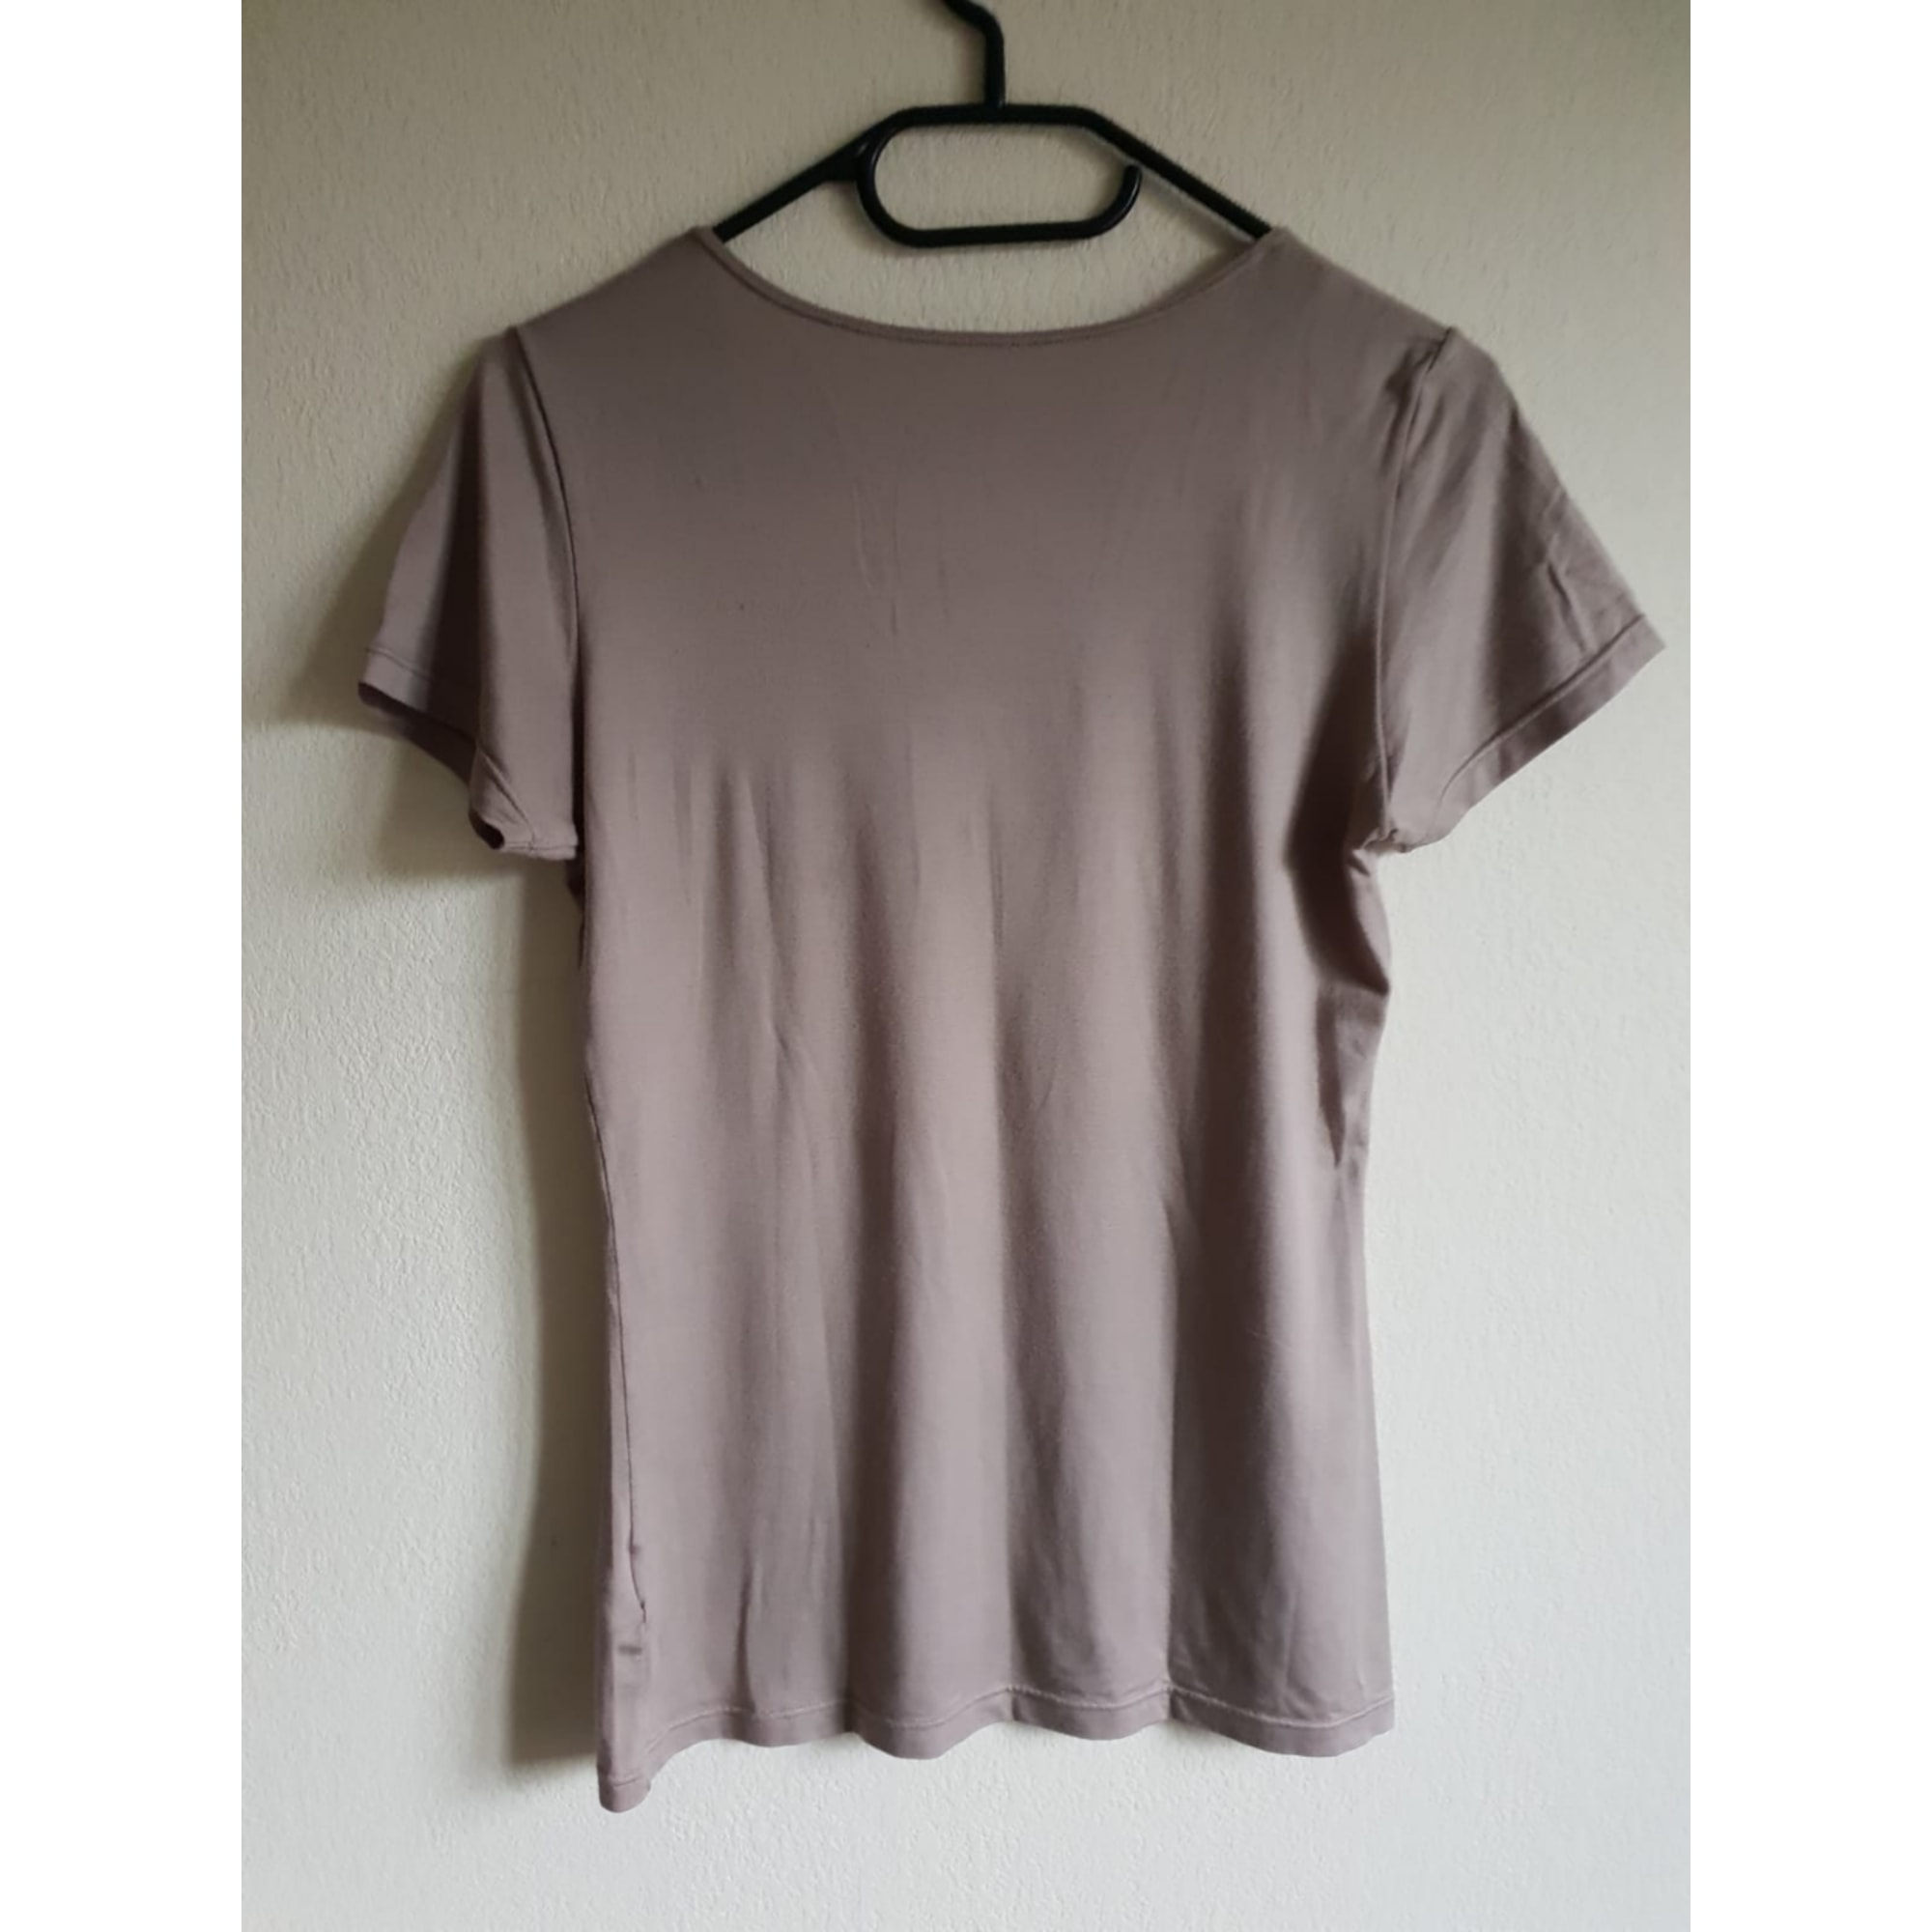 Top, tee-shirt UNIQLO Beige, camel